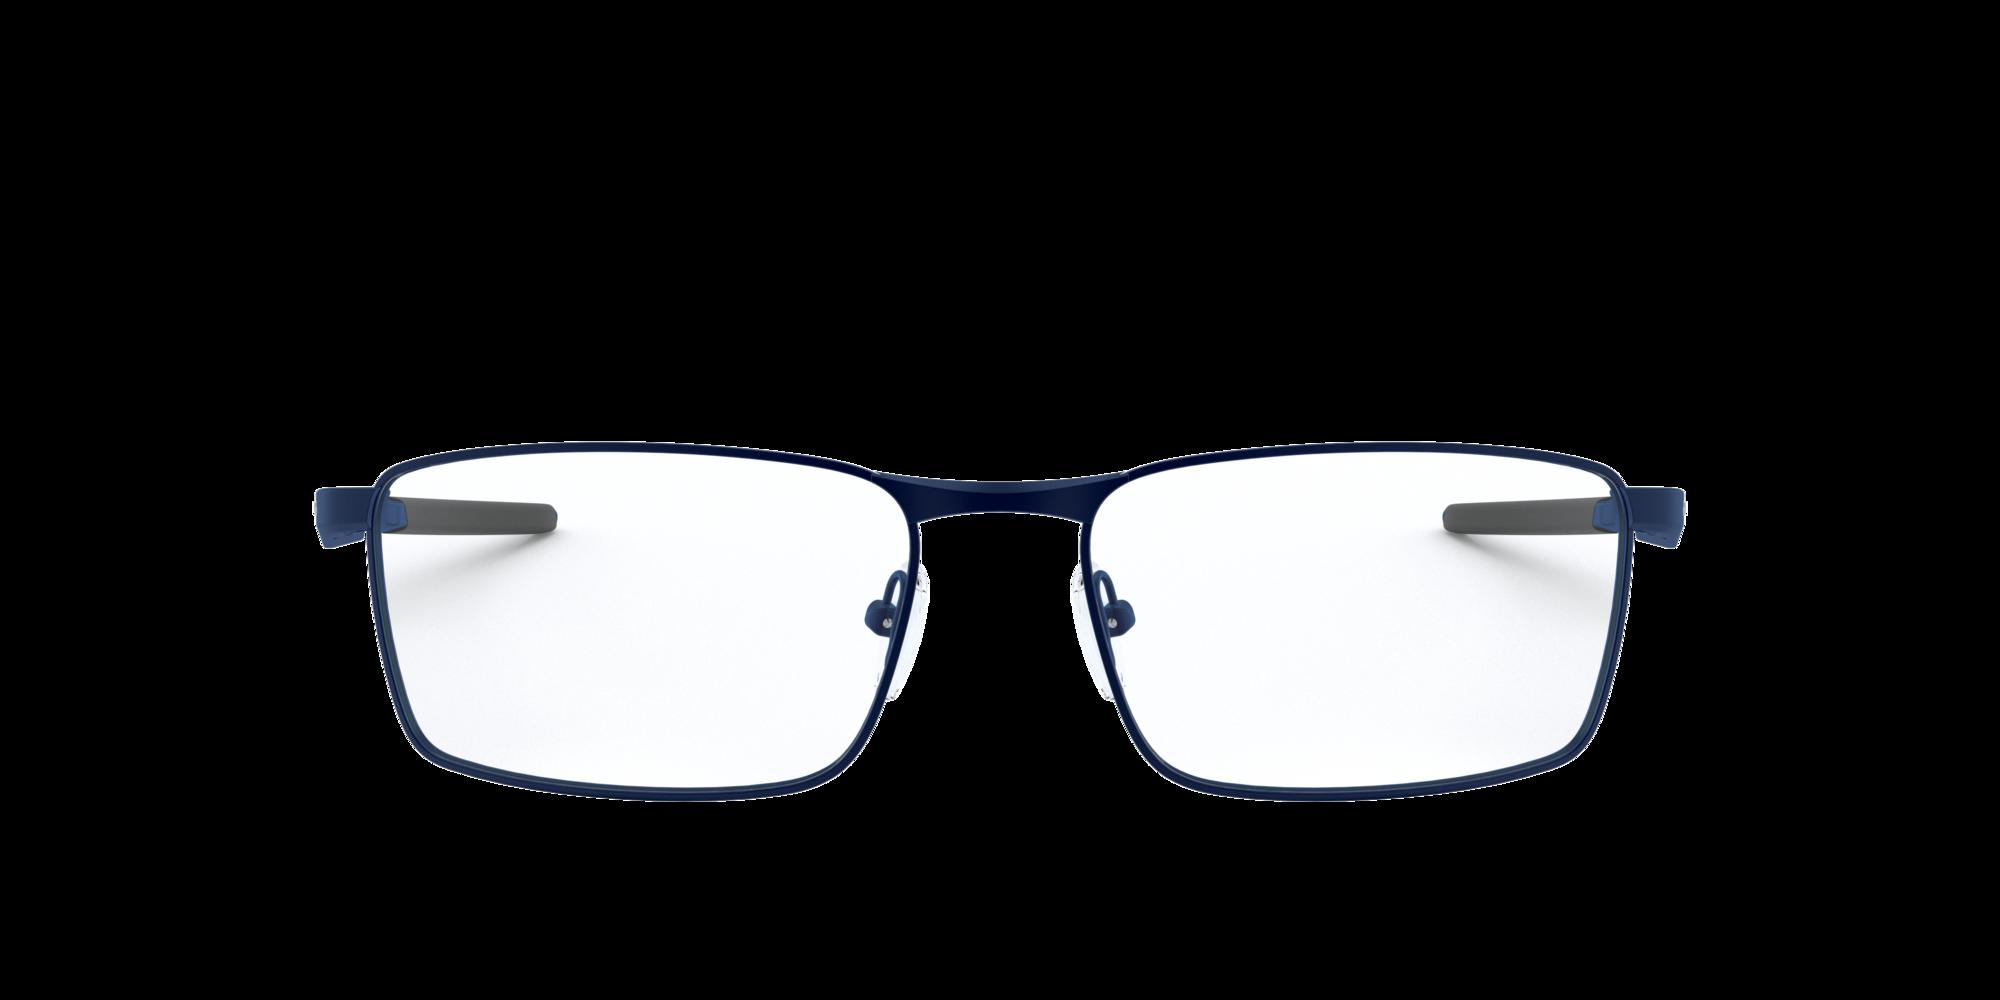 Image for OX3227 FULLER from LensCrafters | Glasses, Prescription Glasses Online, Eyewear